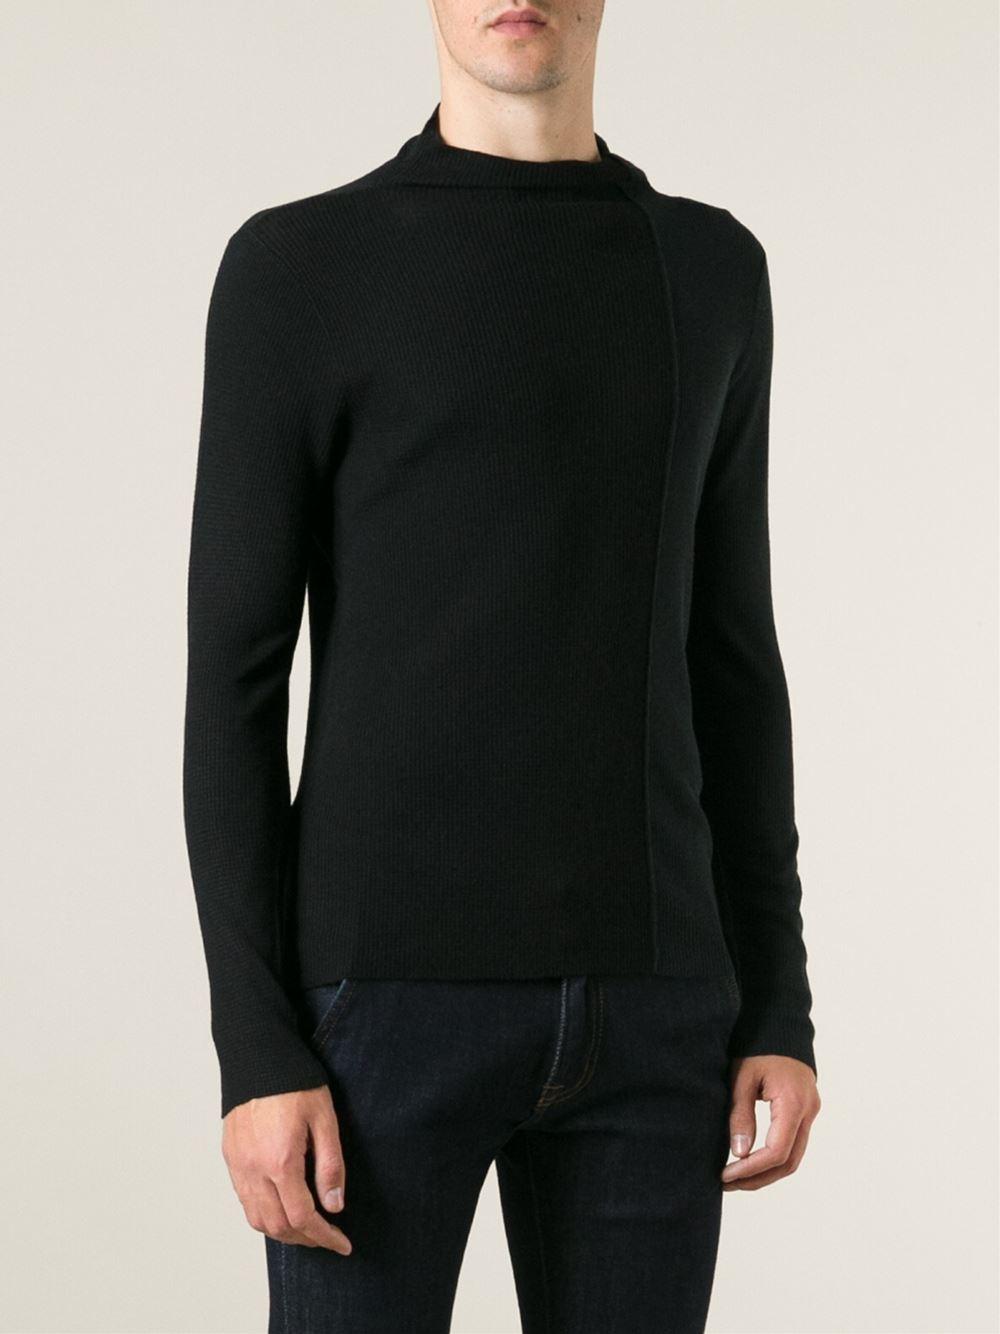 emporio armani crew neck sweater in black for men lyst. Black Bedroom Furniture Sets. Home Design Ideas